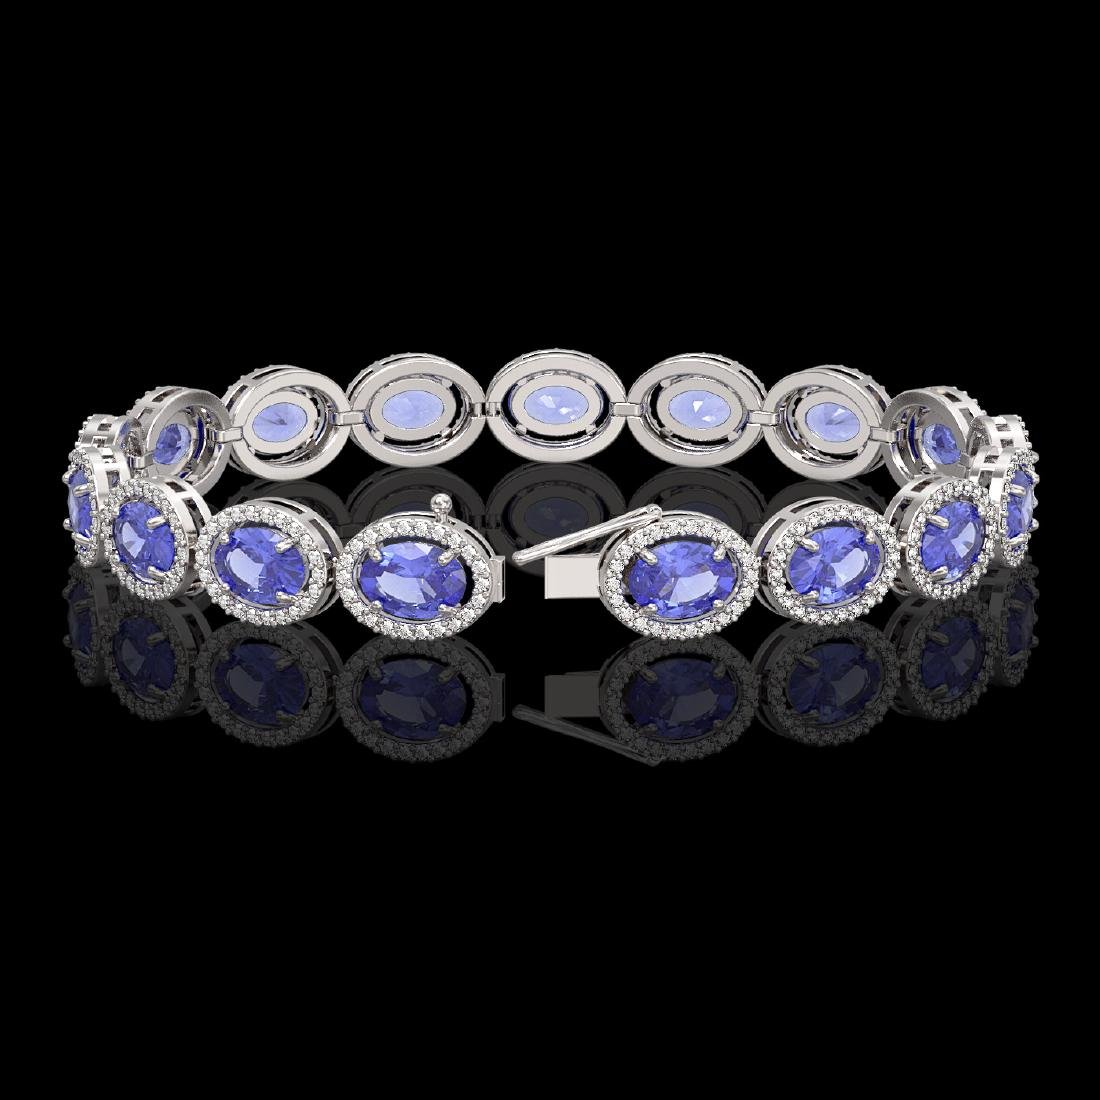 21.35 CTW Tanzanite & Diamond Halo Bracelet 10K White - 2